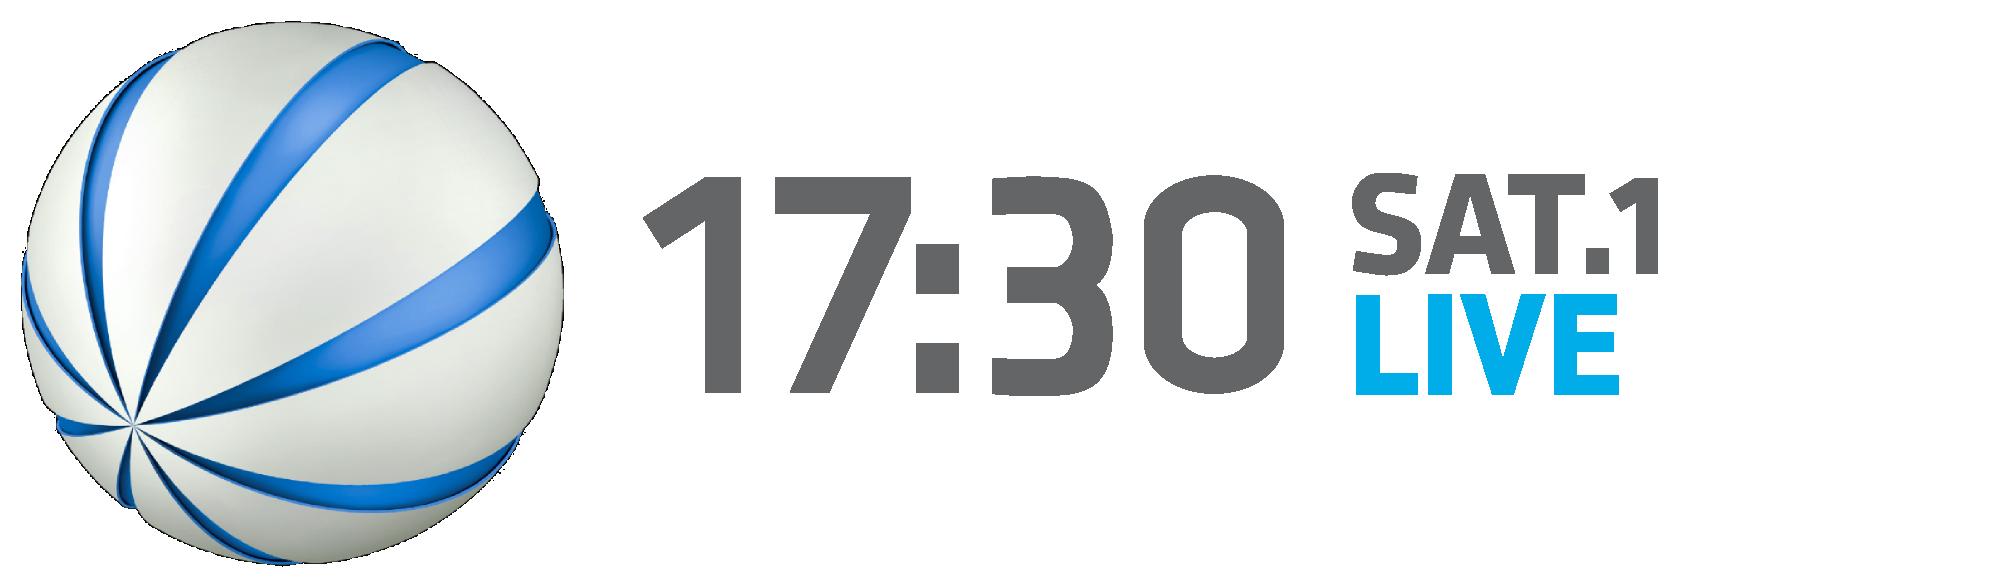 Datei:Sat1 Live Logo.png - Wikipedia